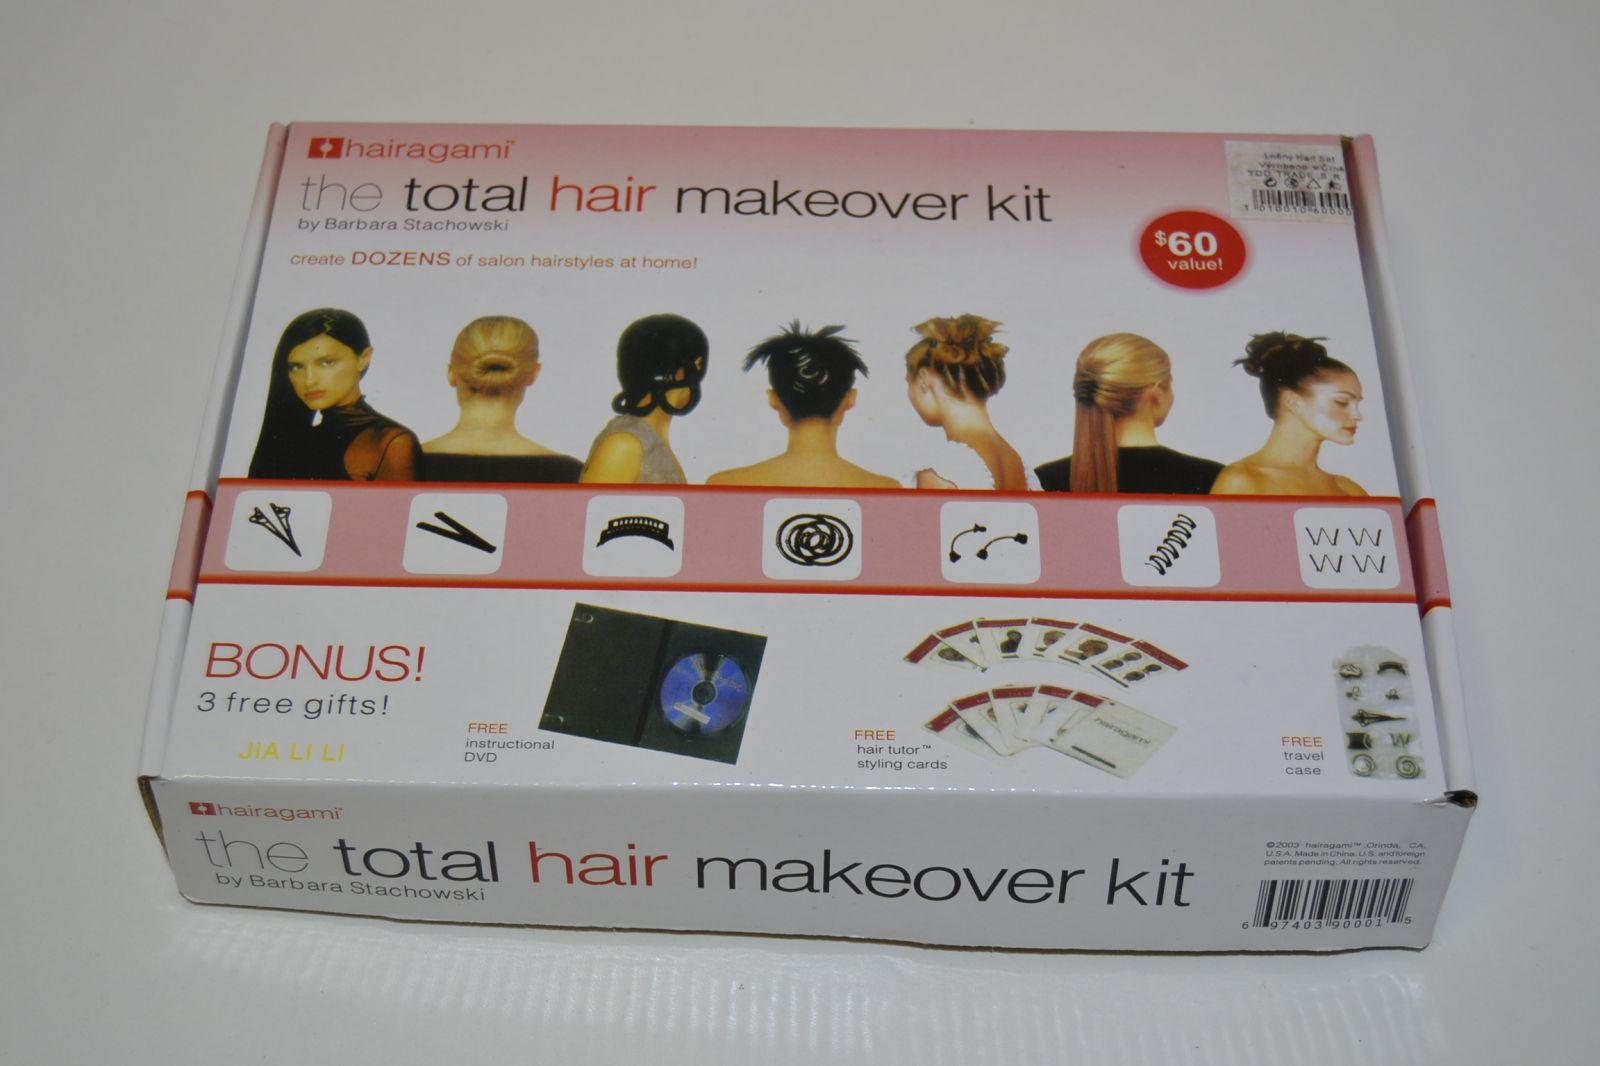 ÚČESOVÁ SADA + DVD TOTAL HAIR HAIRAGAMI - STYLING